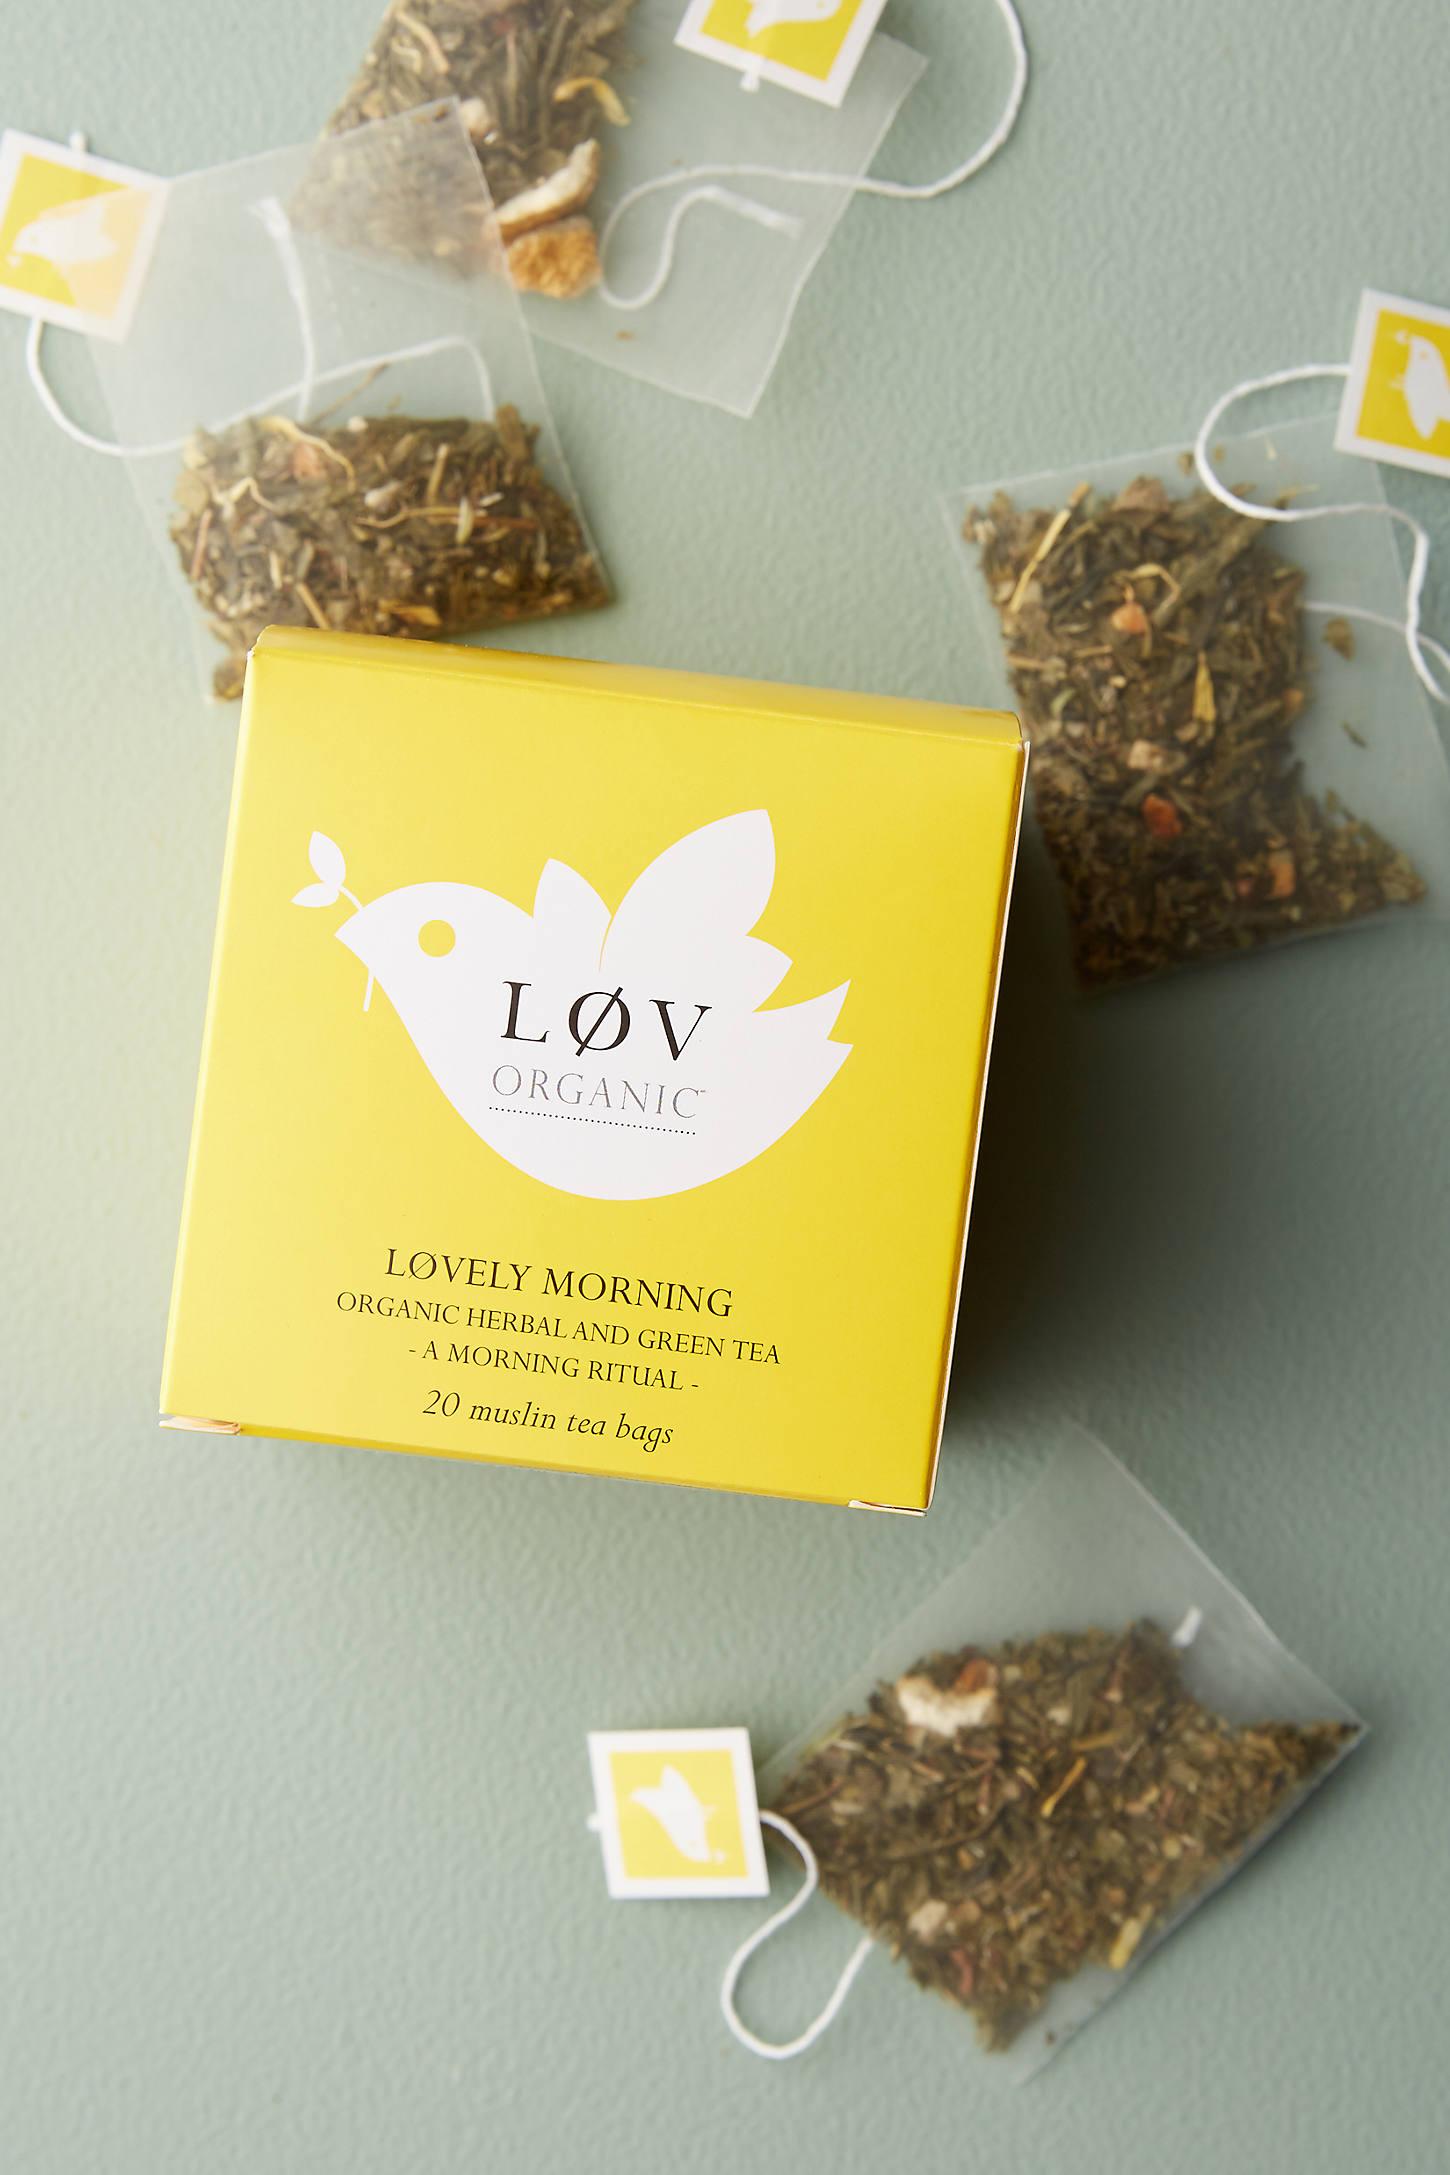 Lov Organic Tea Box